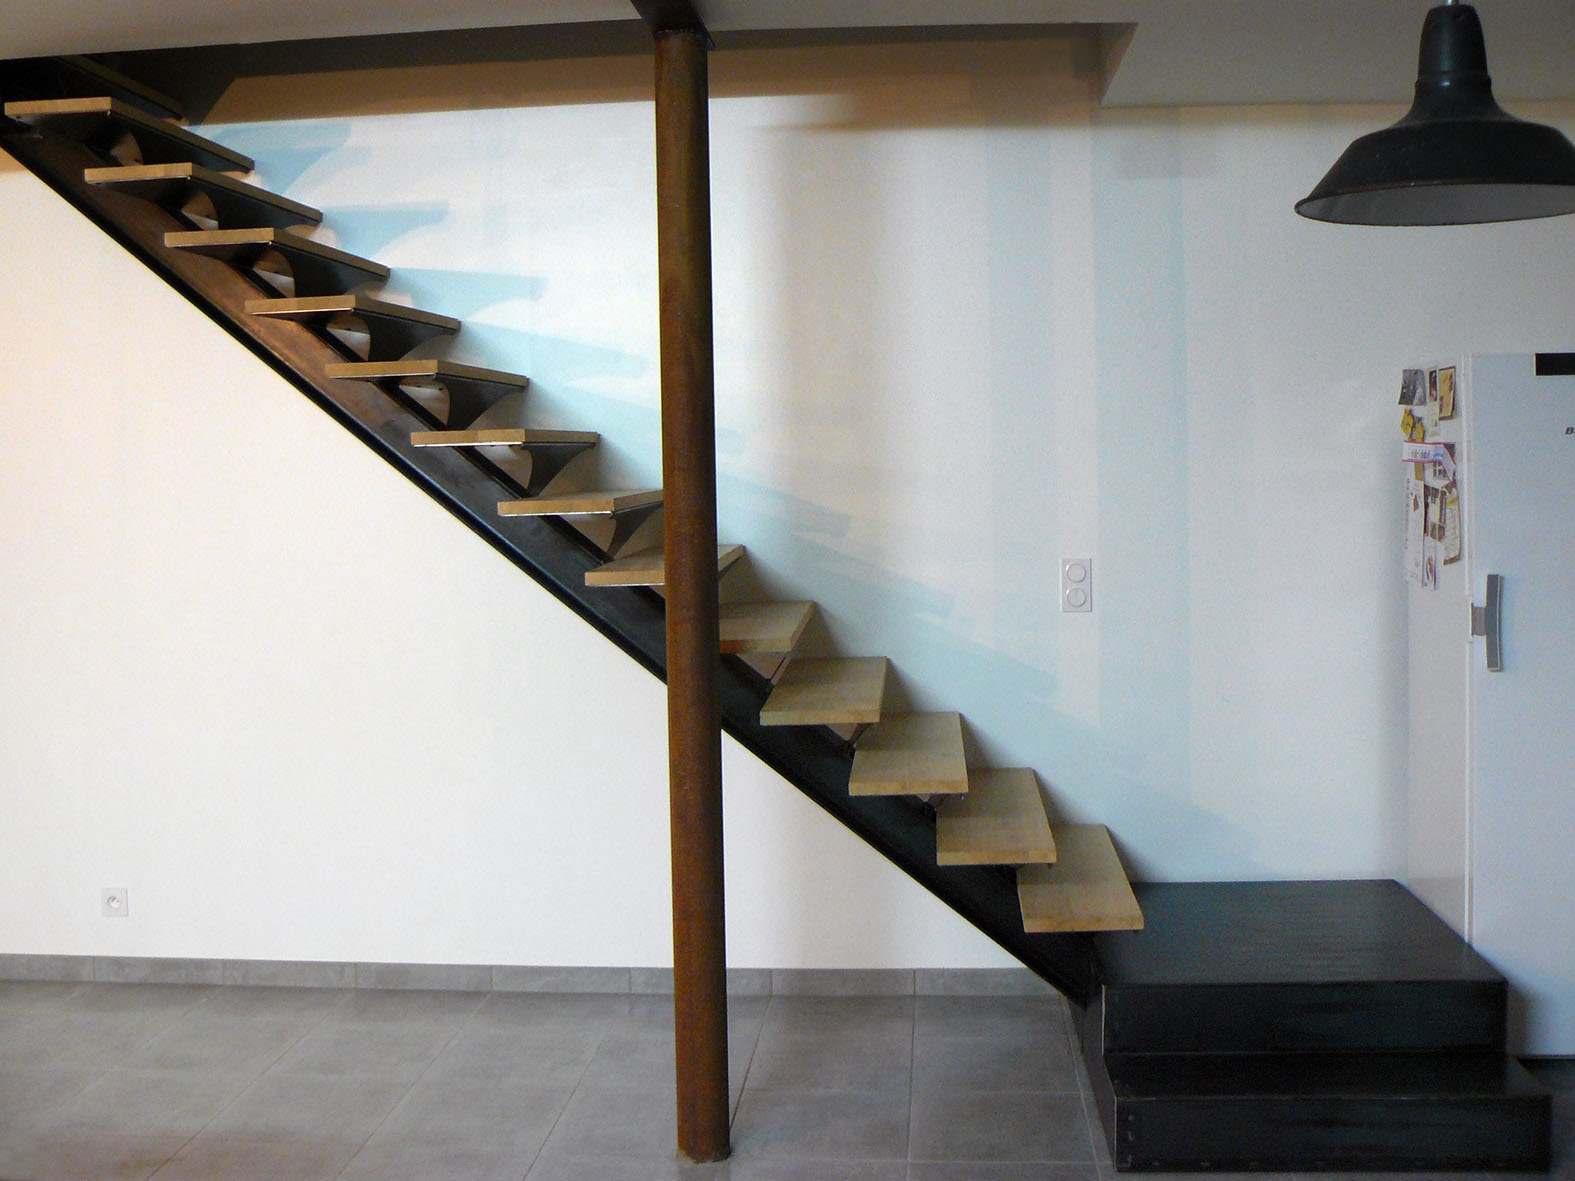 ferronnerie m tallerie serrurerie 79 deux s vres l 39 art du fer play escalier 1 4 tournant en. Black Bedroom Furniture Sets. Home Design Ideas